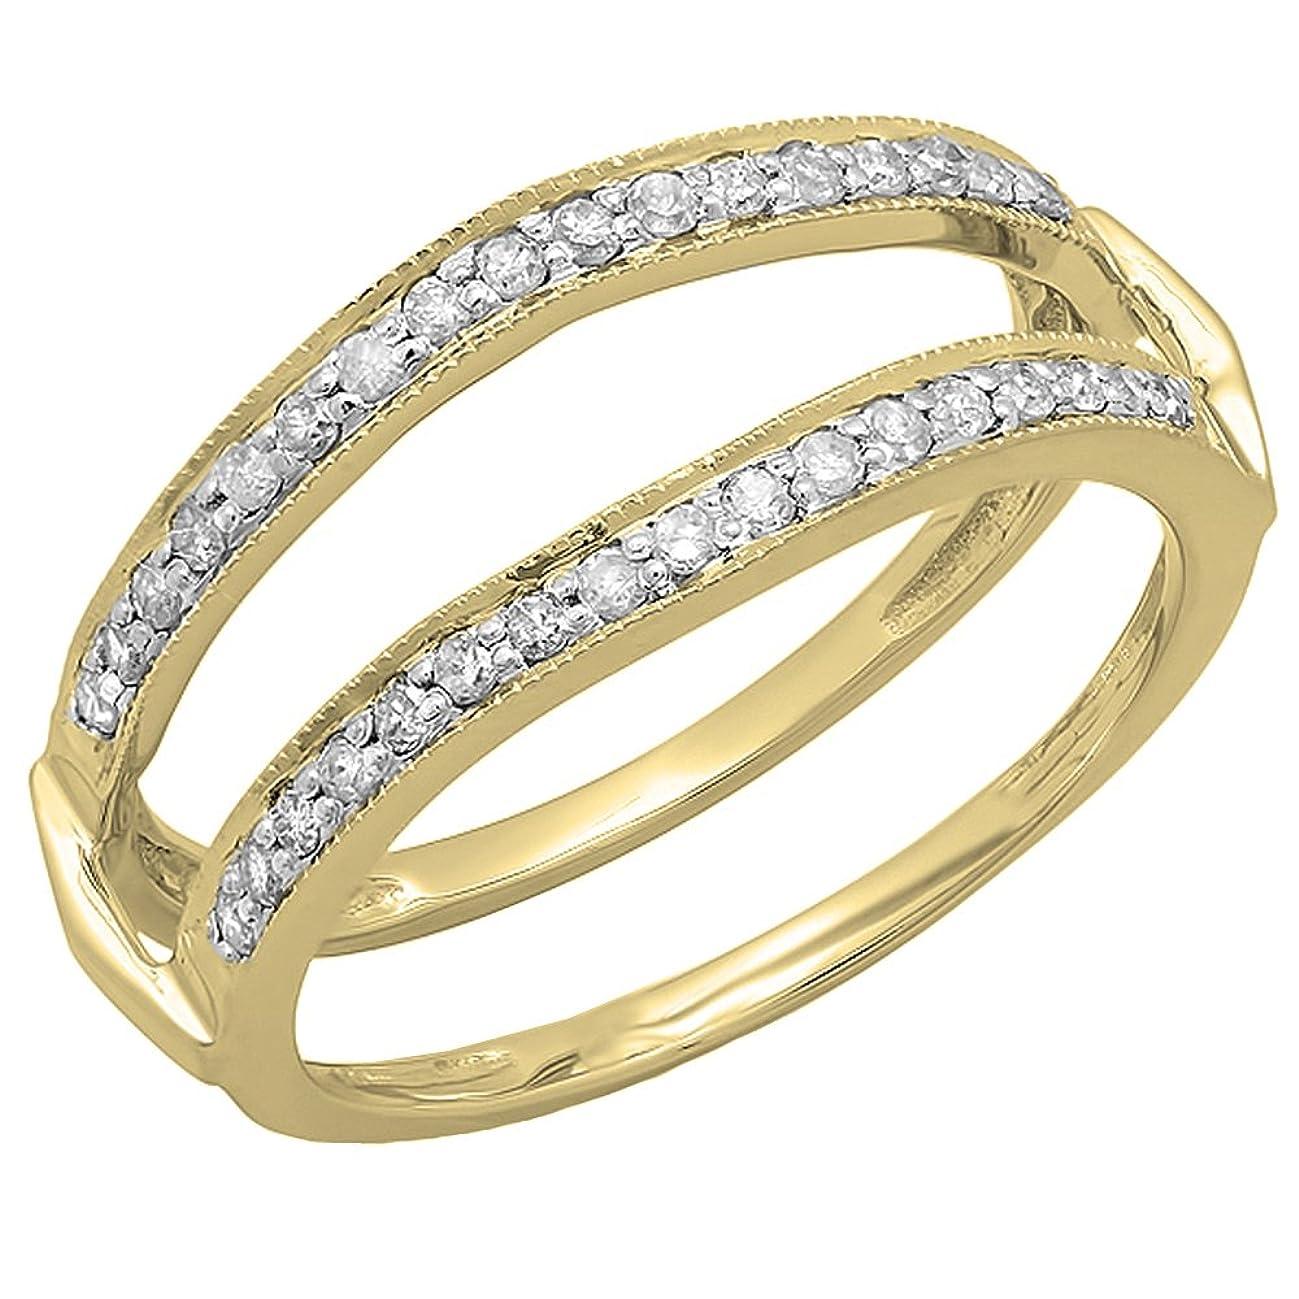 0.33 Carat (ctw) 14K Gold Round Diamond Ladies Millgrain Wedding Band Double Guard Ring 1/3 CT